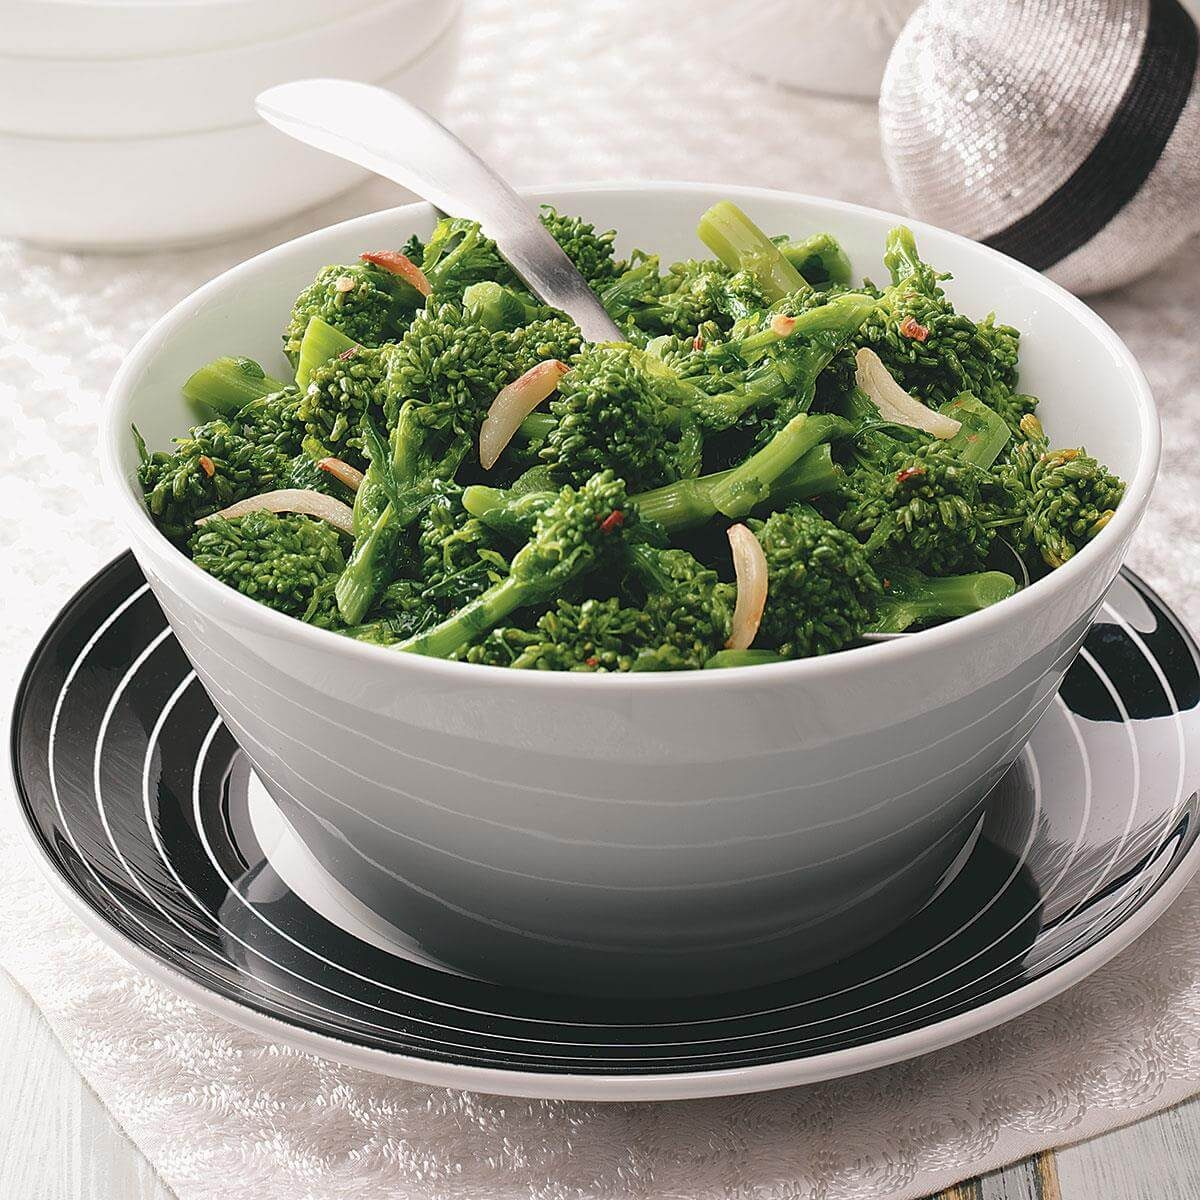 Spicy Garlic Broccoli Rabe images